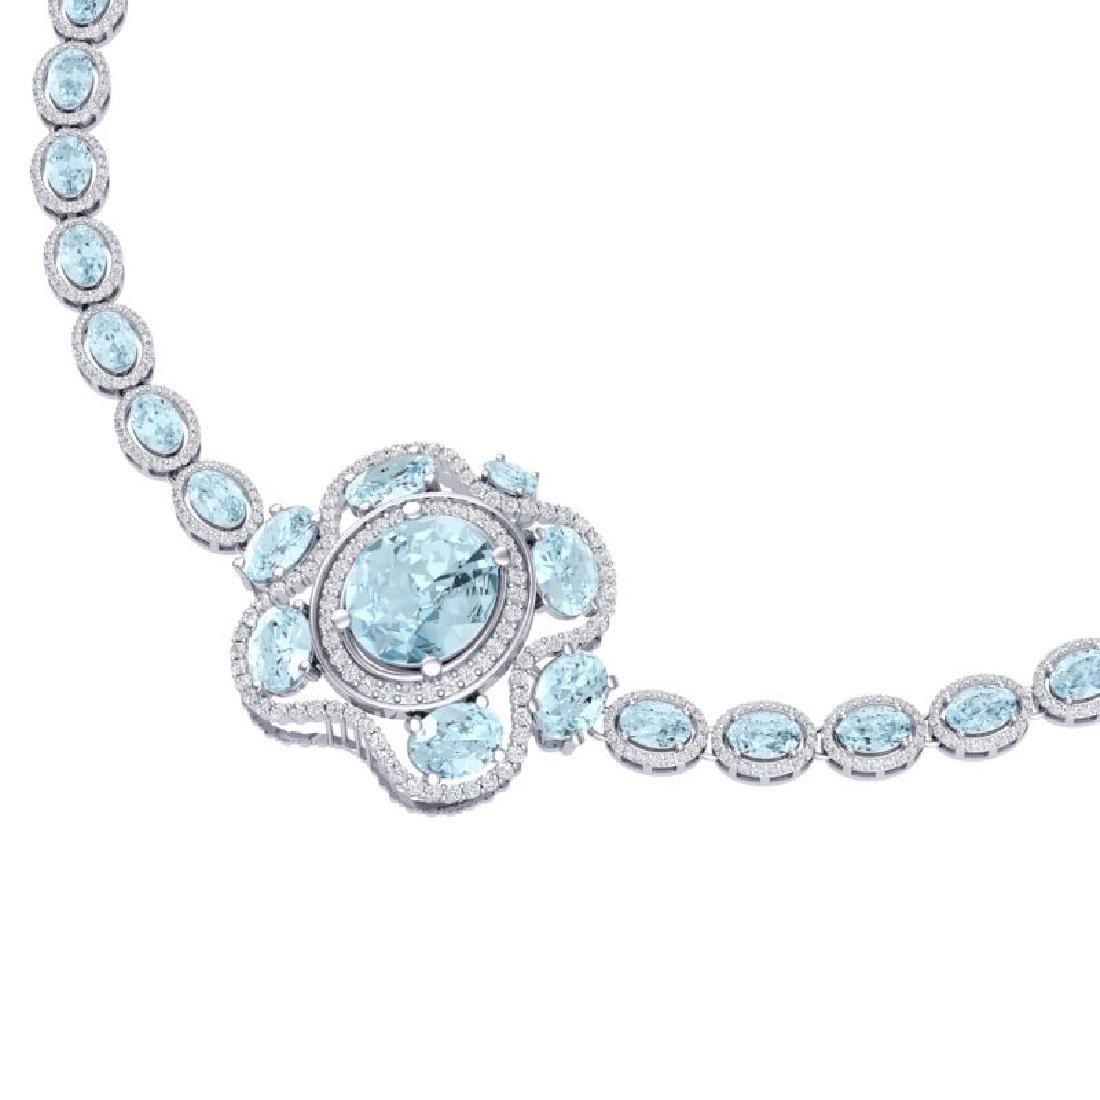 47.72 CTW Royalty Sky Topaz & VS Diamond Necklace 18K